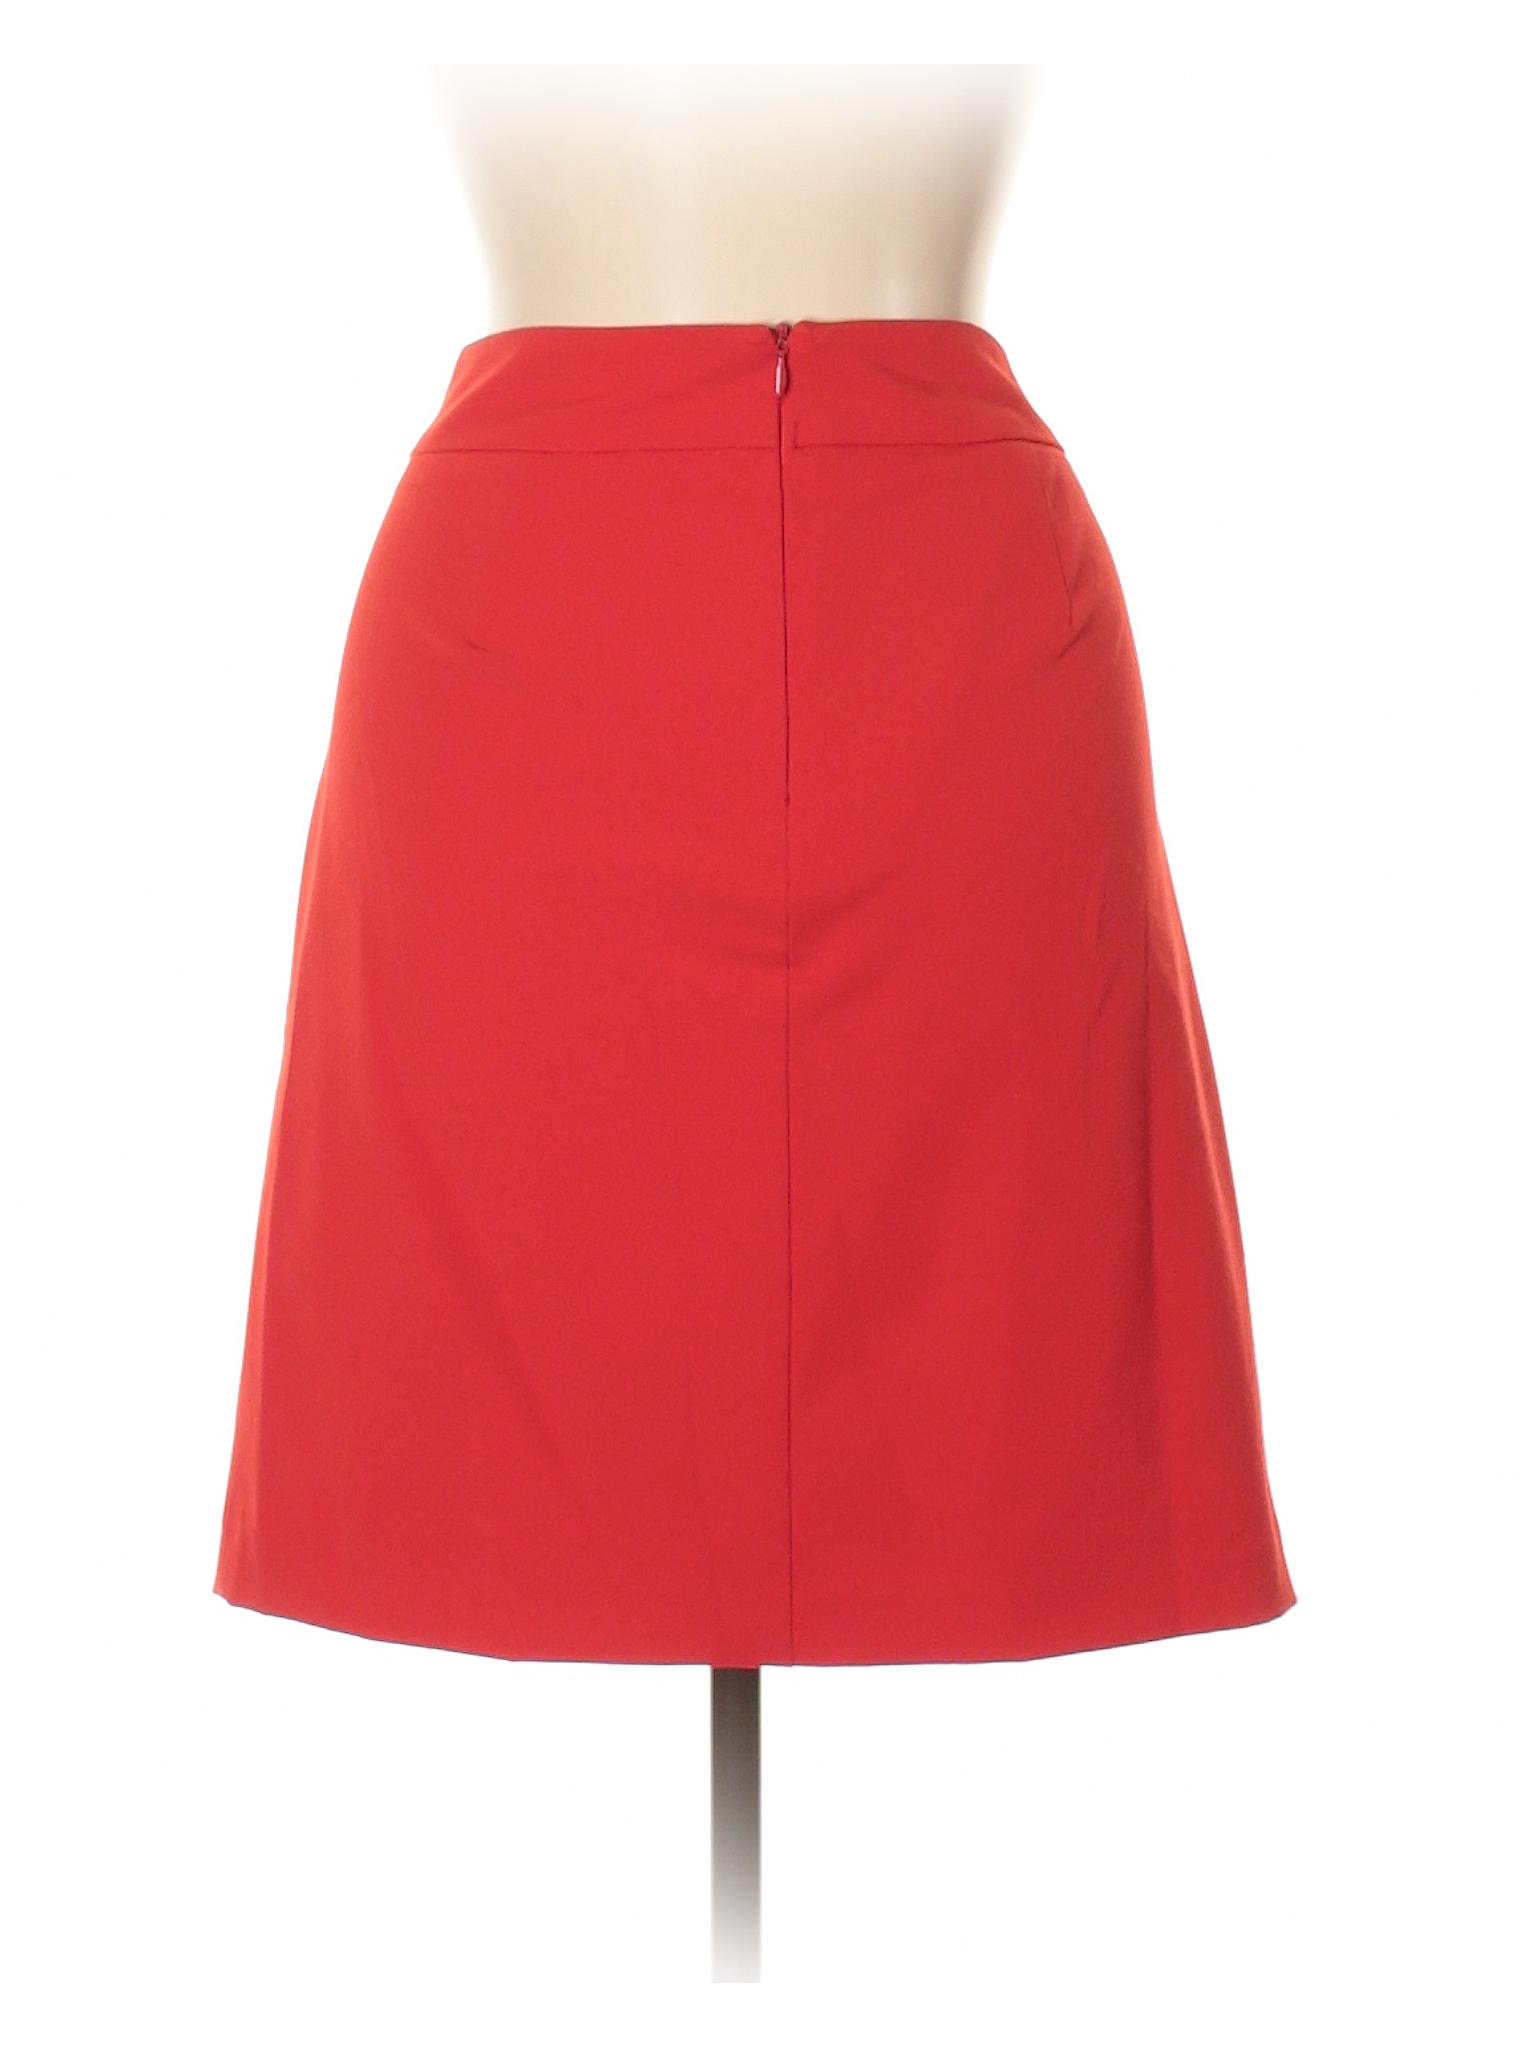 Skirt Boutique Casual Boutique Casual q6t540